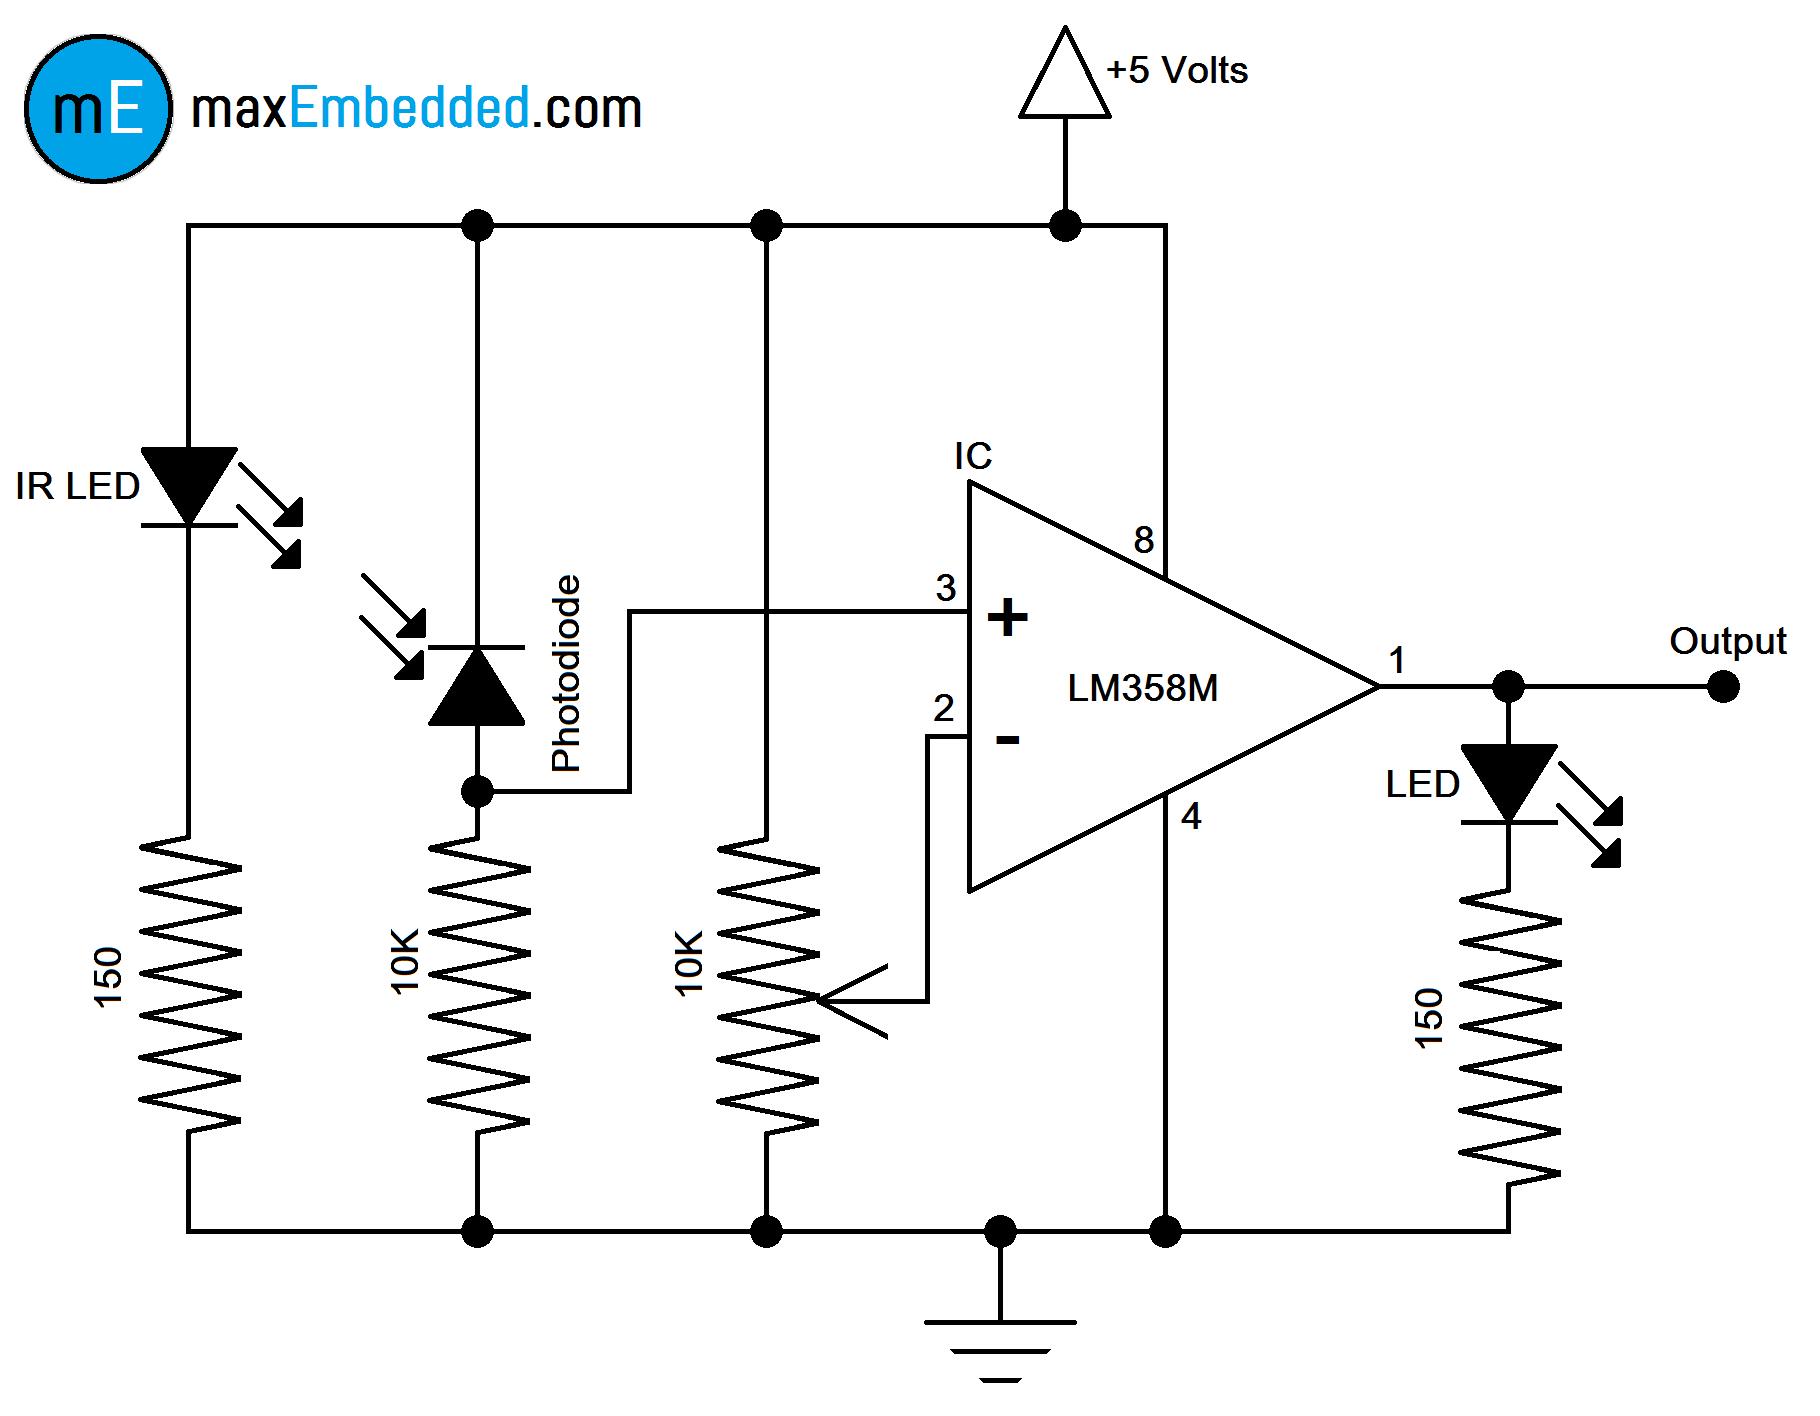 hight resolution of ir sensor circuit schematic wiring diagram online simple ir proximity sensor circuit diagram how to build